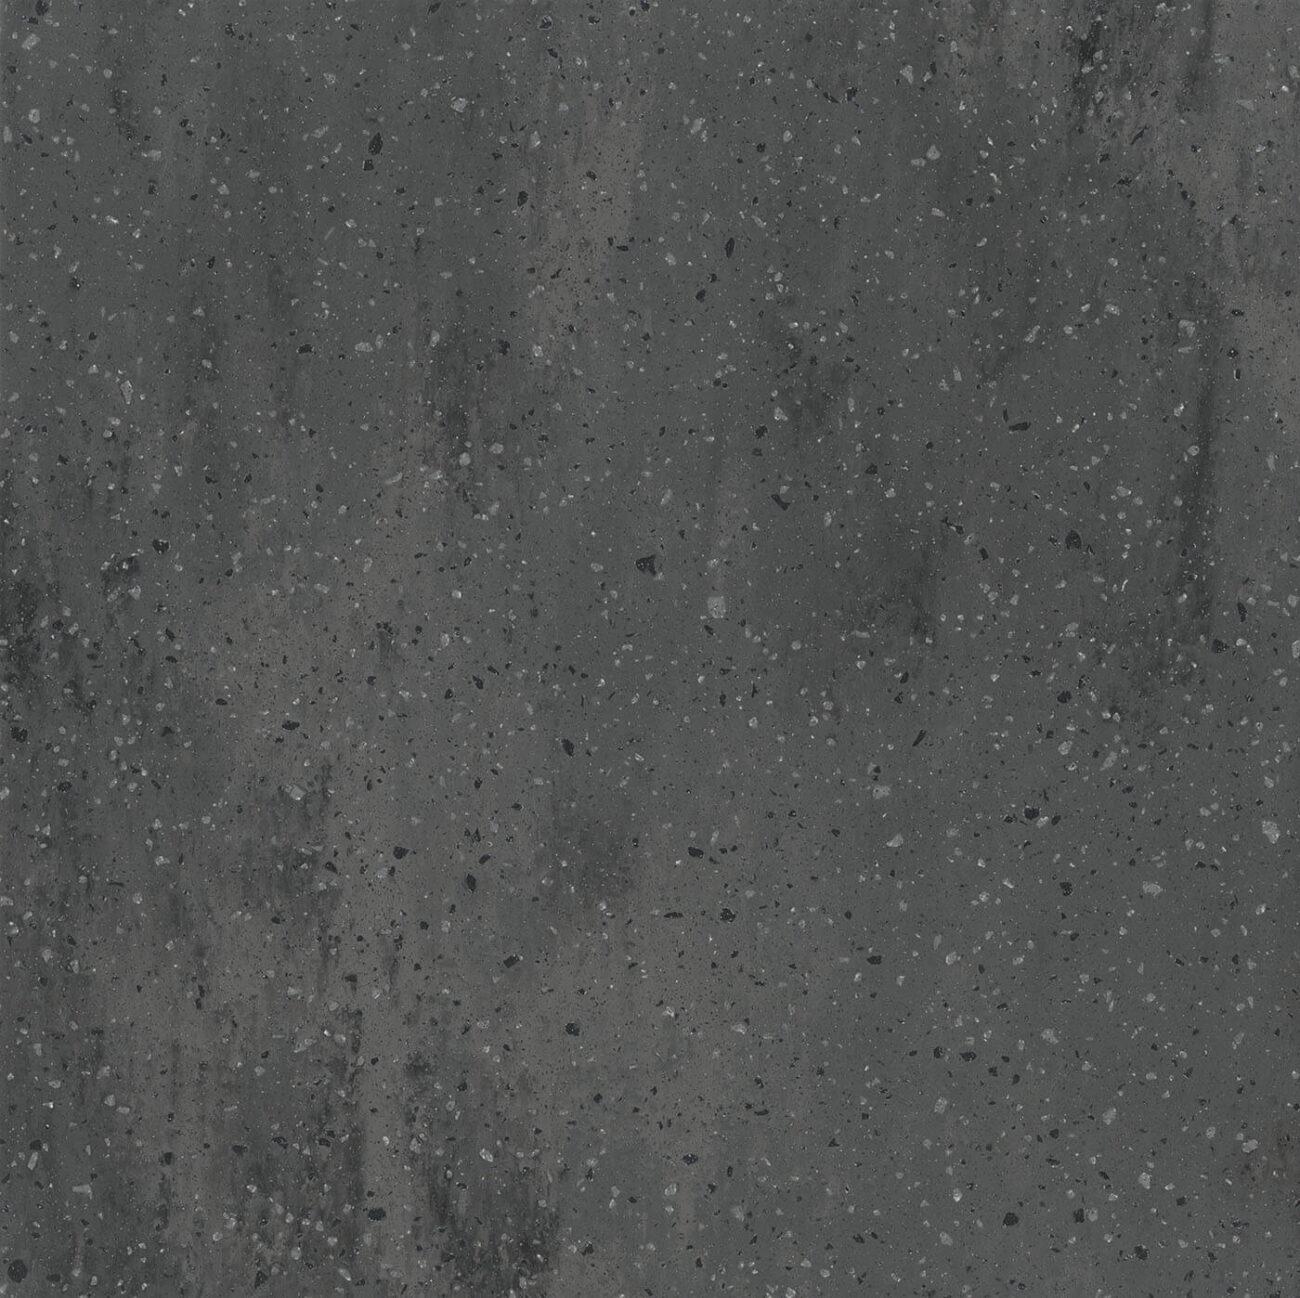 Carbon Aggregate corian kitchen worktop